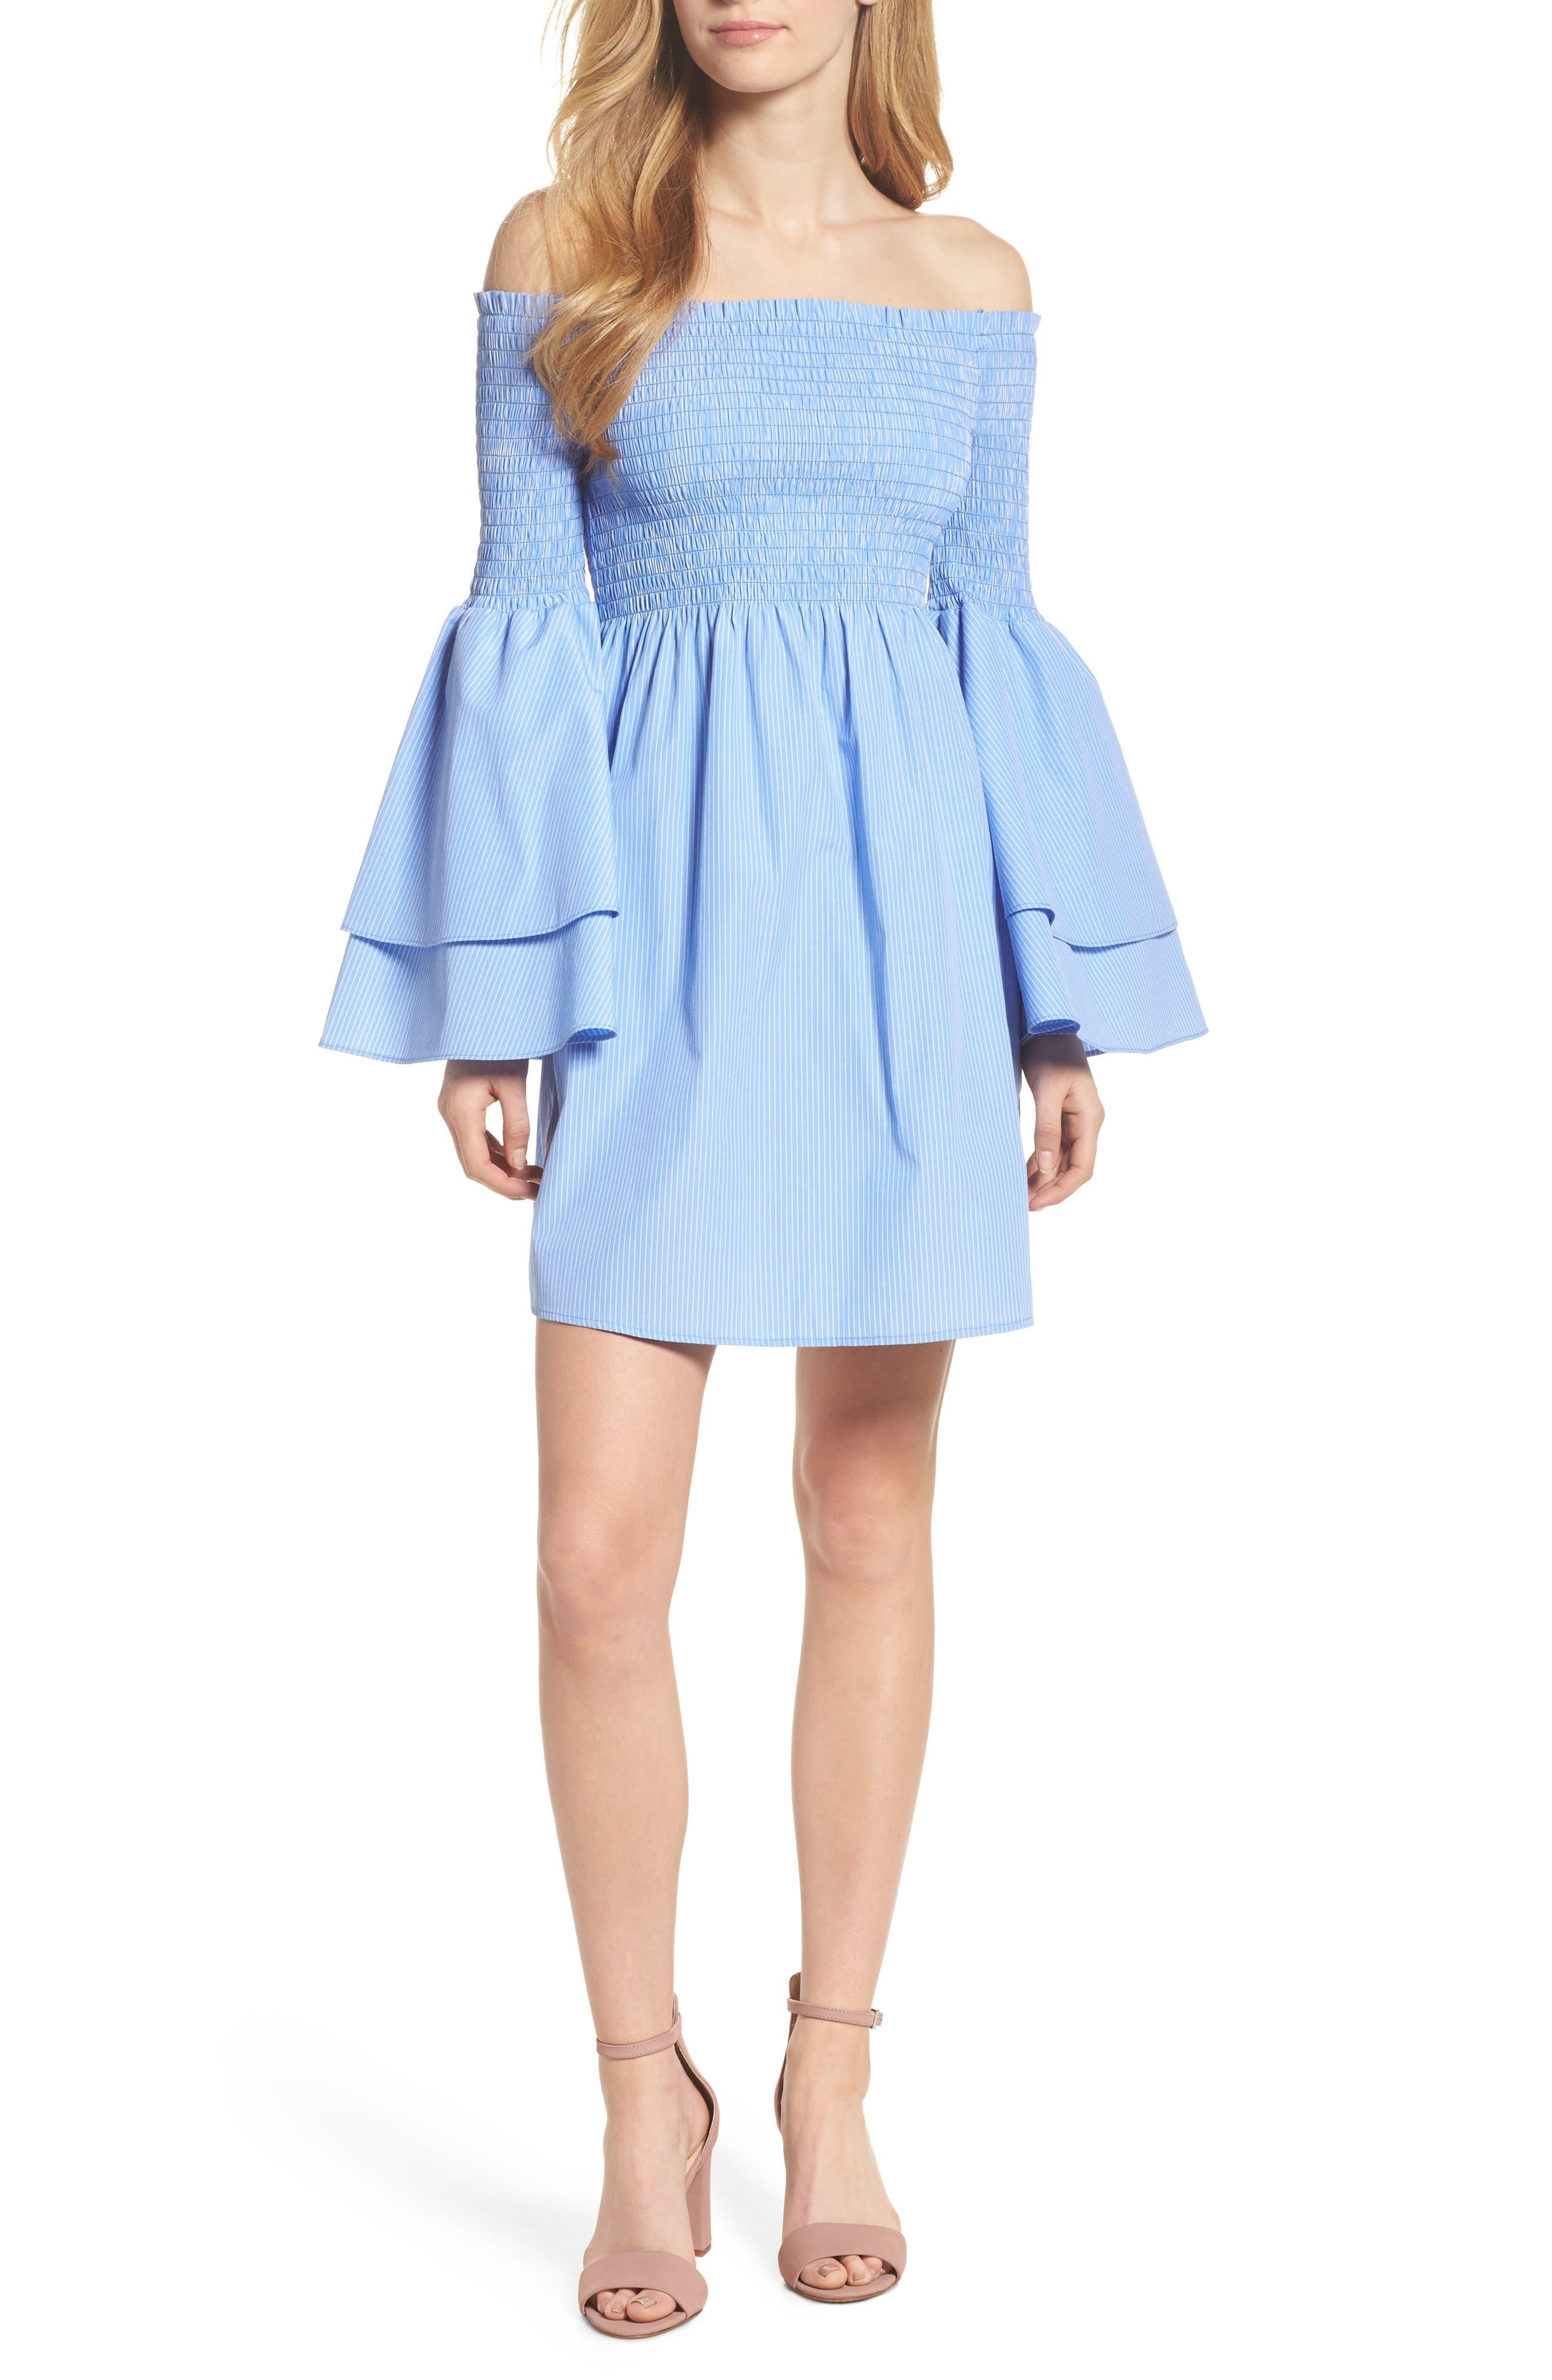 Smocked Off the Shoulder Bell Sleeve Dress,                             Main thumbnail 1, color,                             Blue/ White Stripe